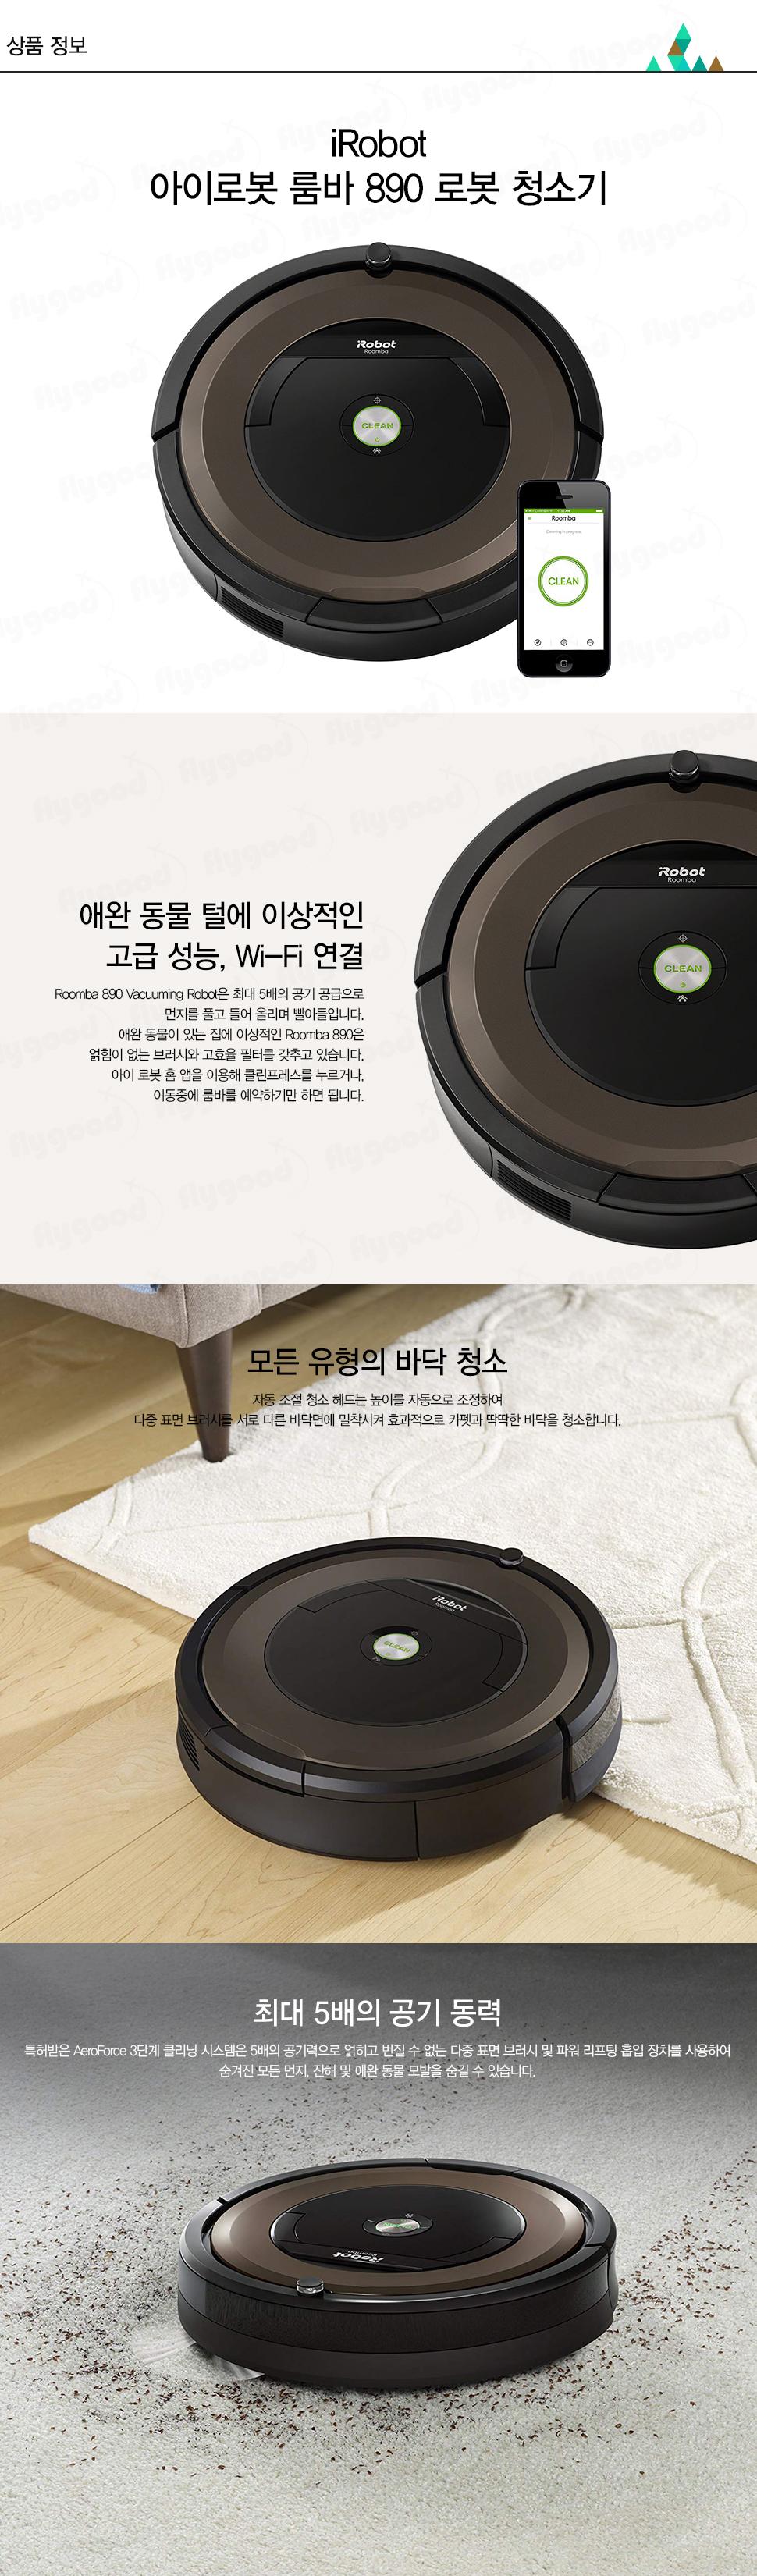 iRobot_Roomba_890_01.jpg